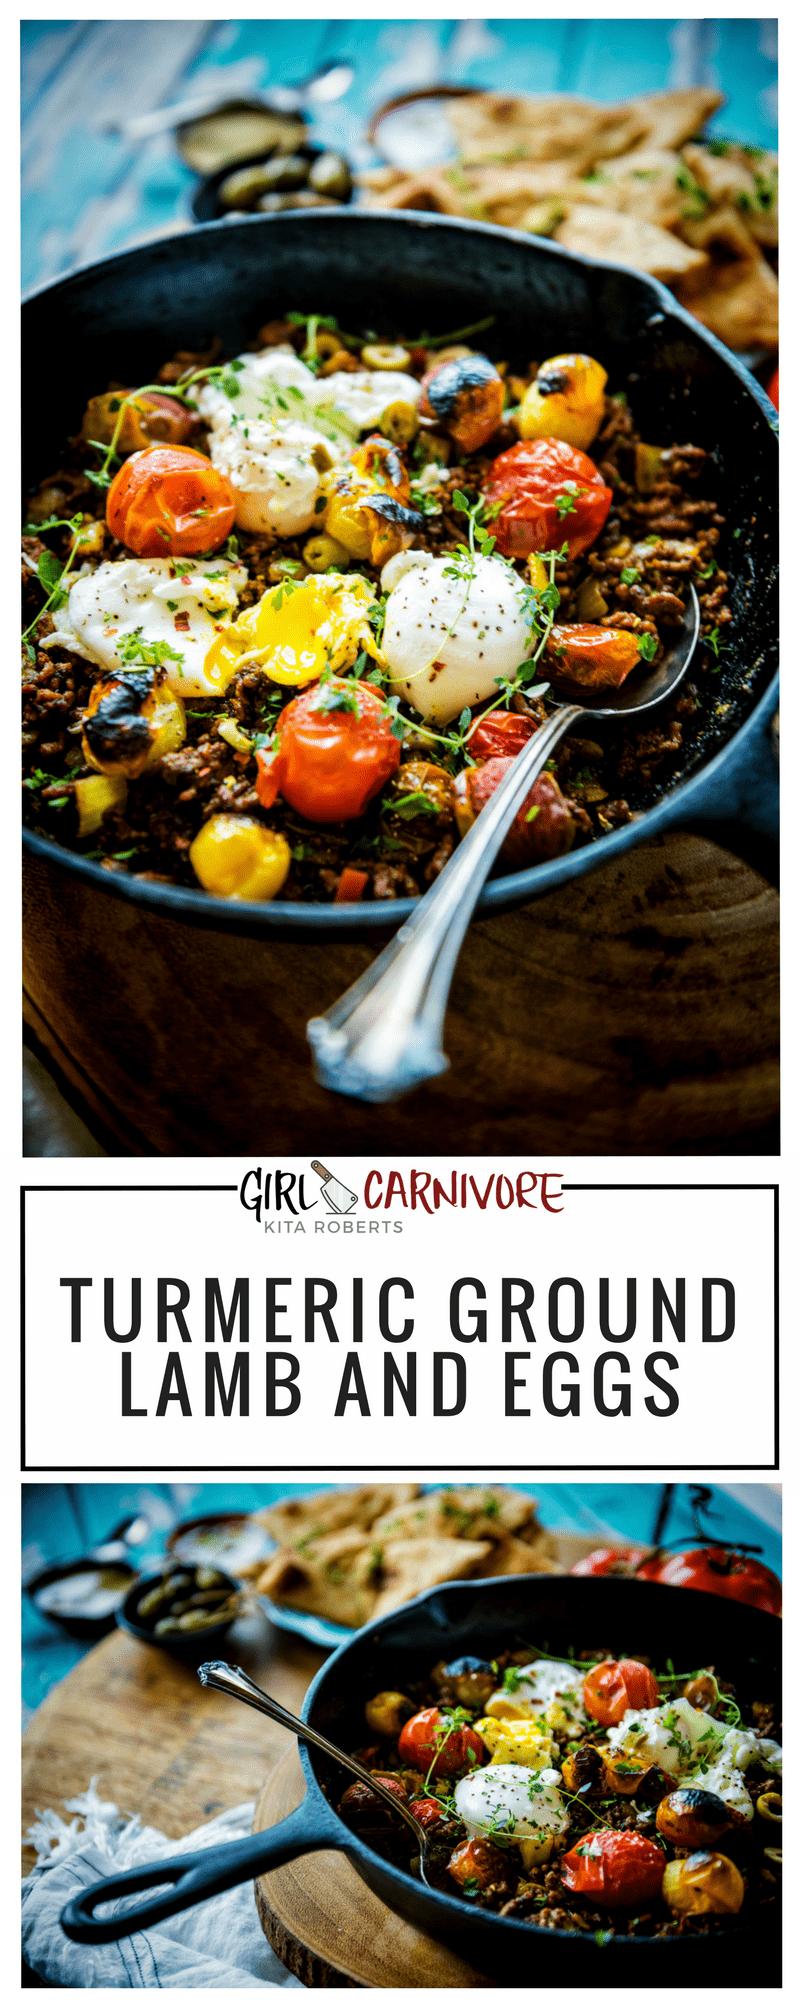 Tumeric Ground Lamb and Eggs Recipe GirlCarnivore